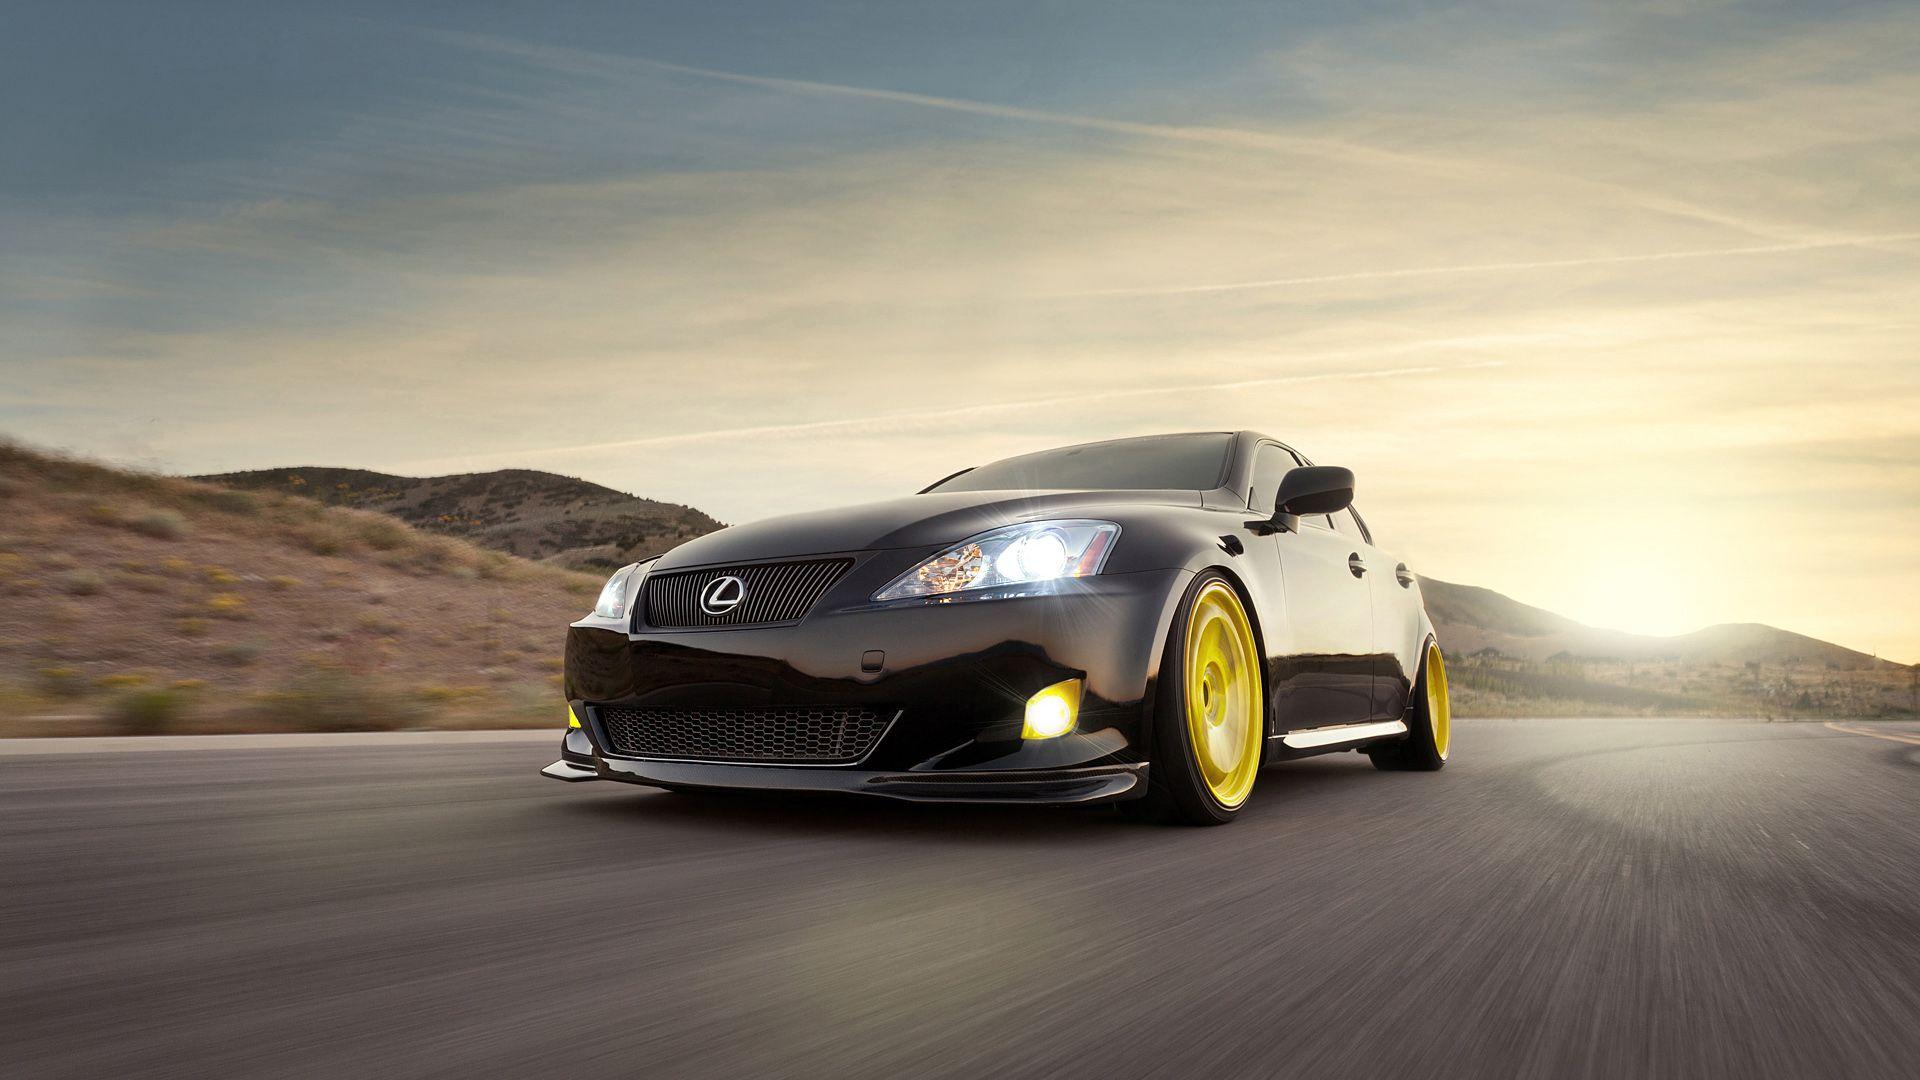 Lexus Is 350 Hd Wallpapers Hd Car Wallpapers Car Photography Lexus Lexus Models